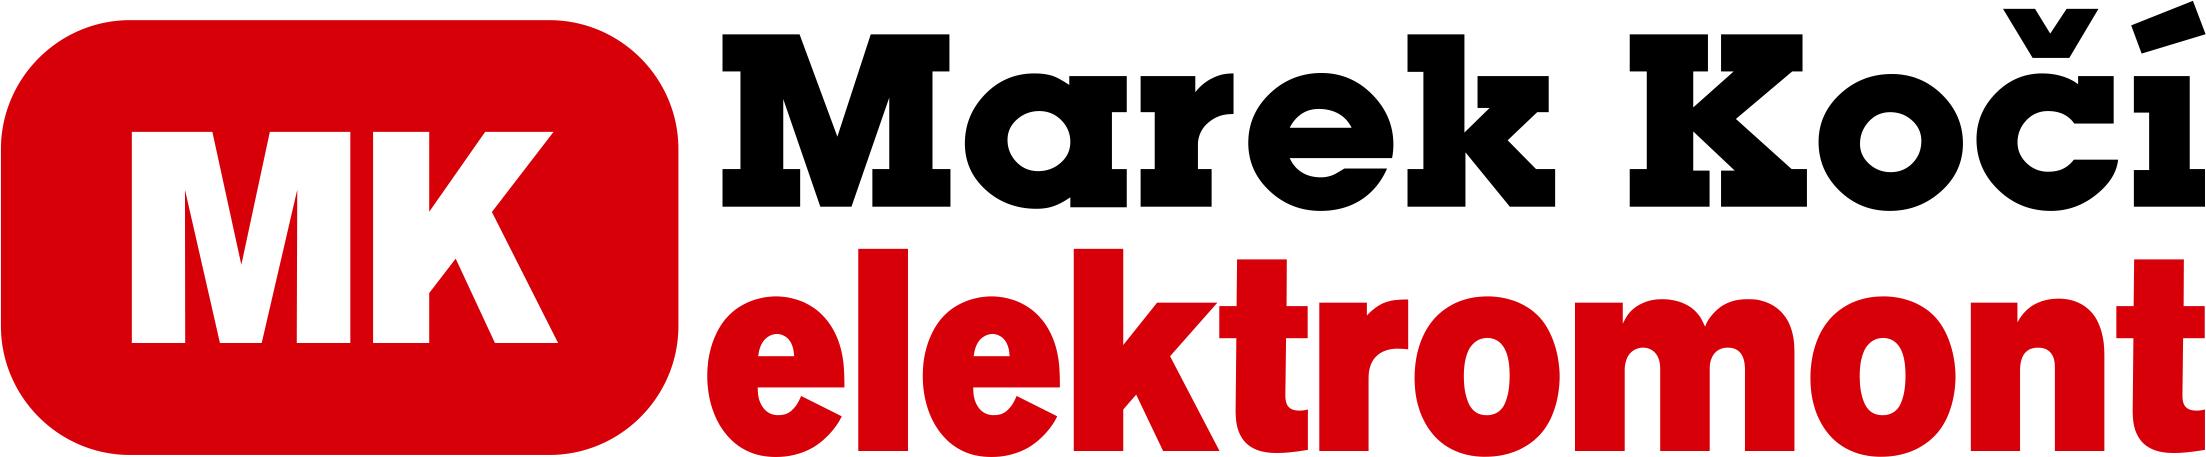 MK Elektromont